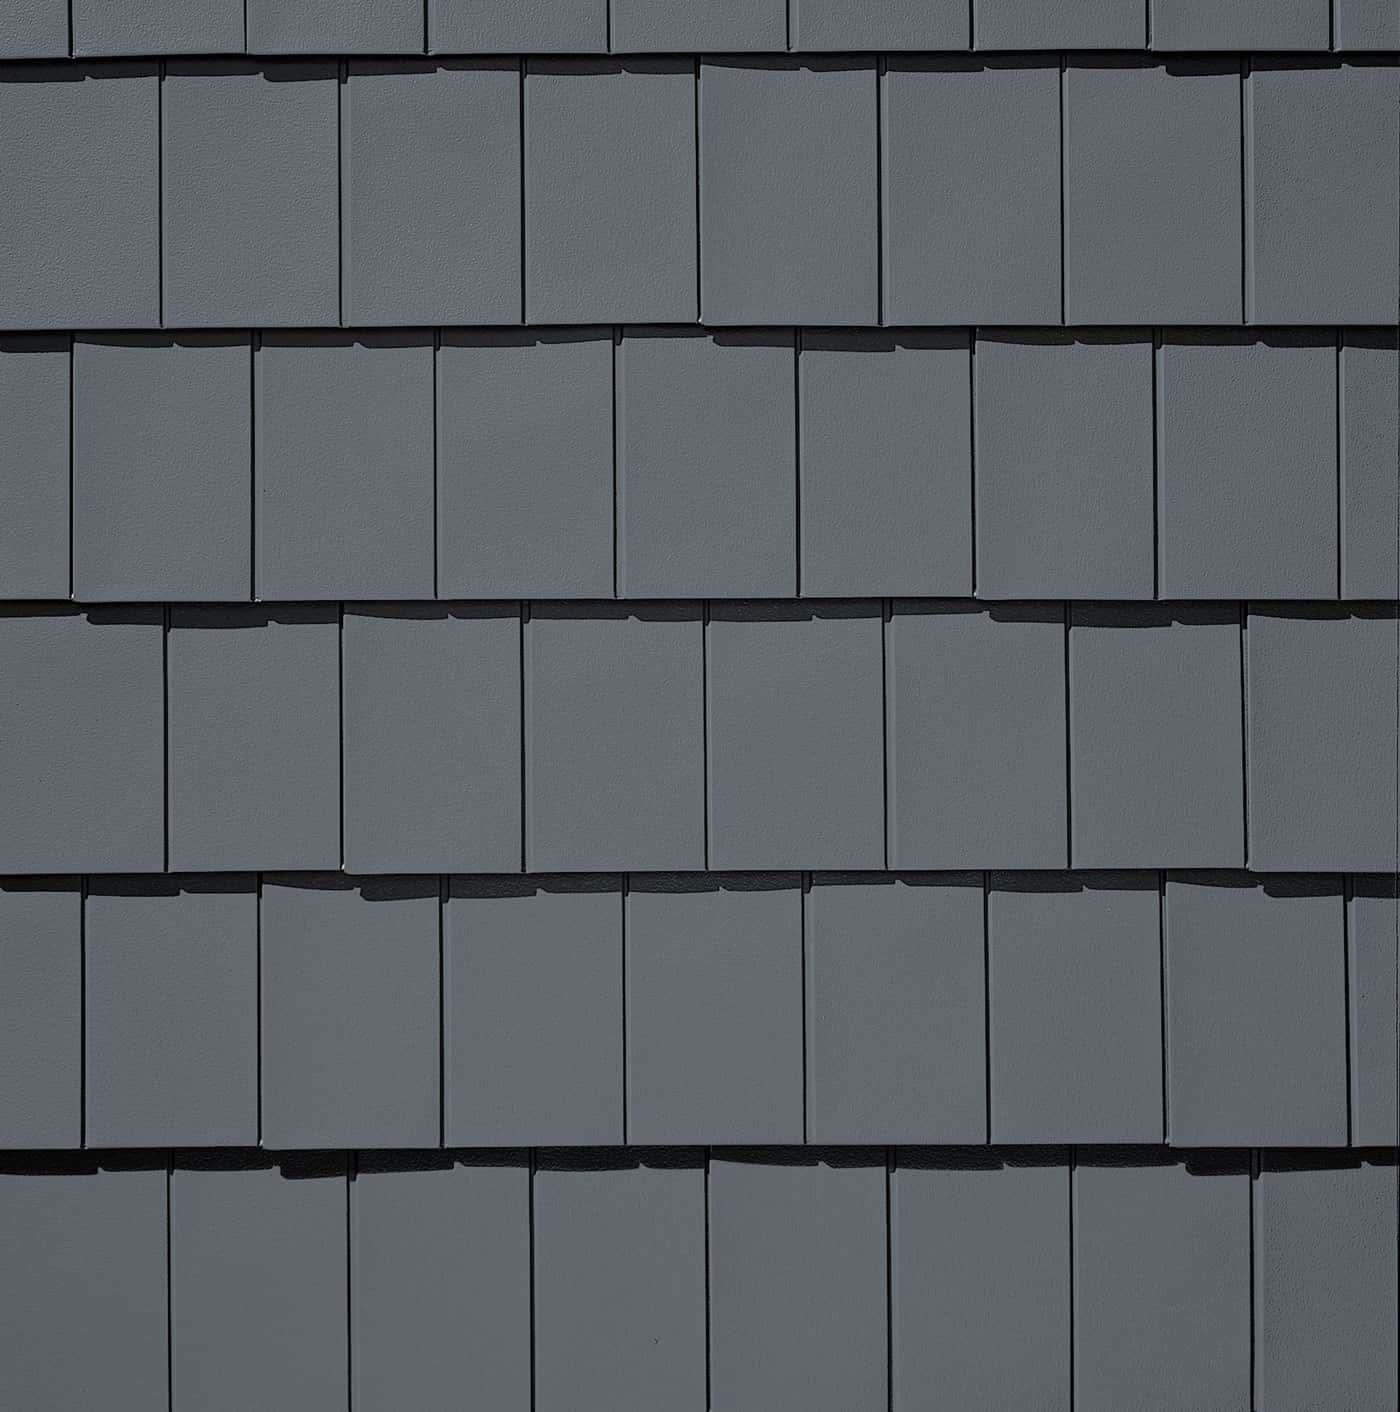 TAMKO Metalworks Stonecrest Tile Sierra Slate Grey Swatch